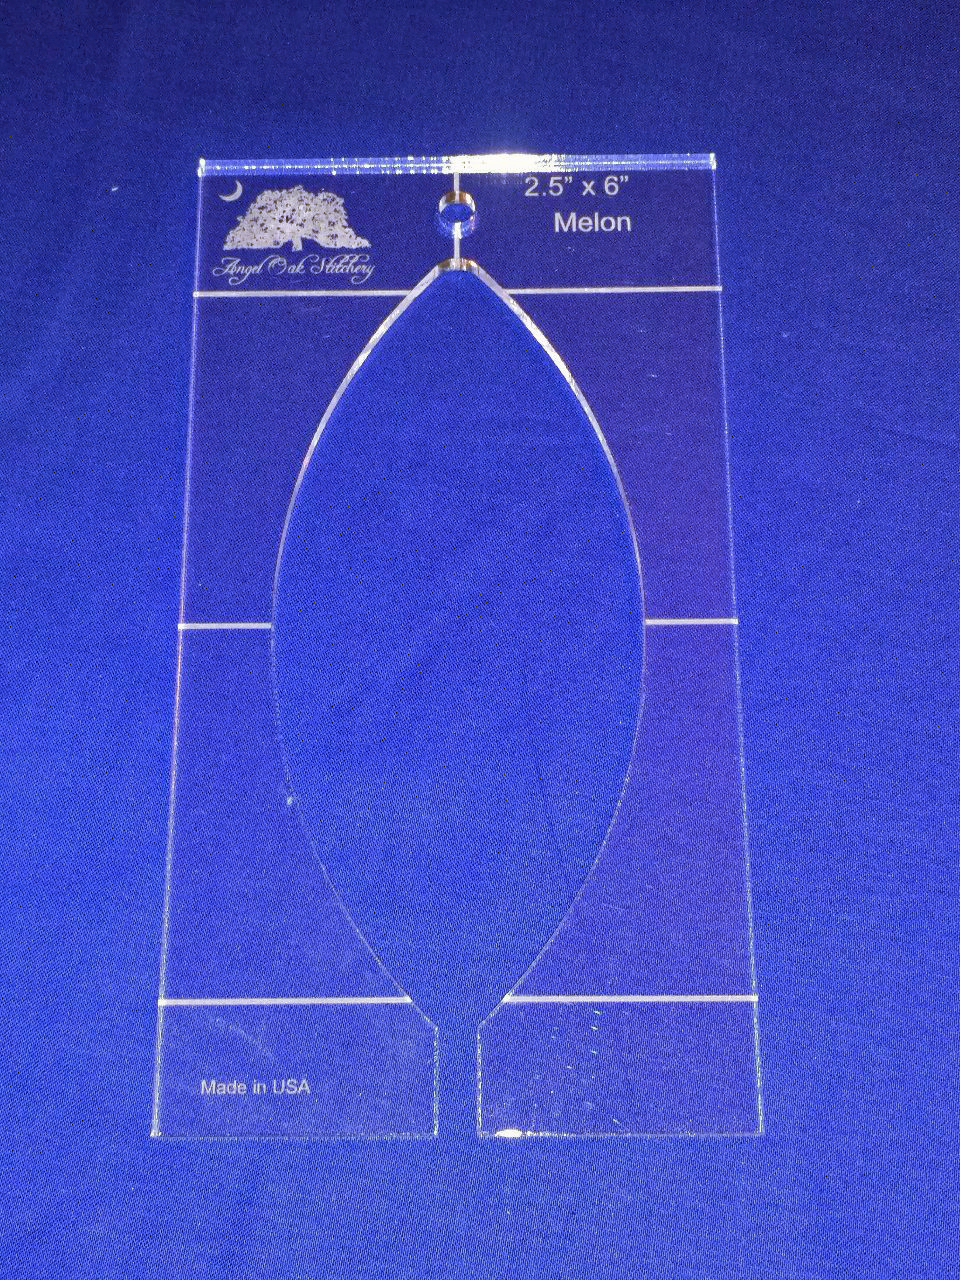 2-1/2 inch x 6 inch Melon Rulerwork Quilting Template